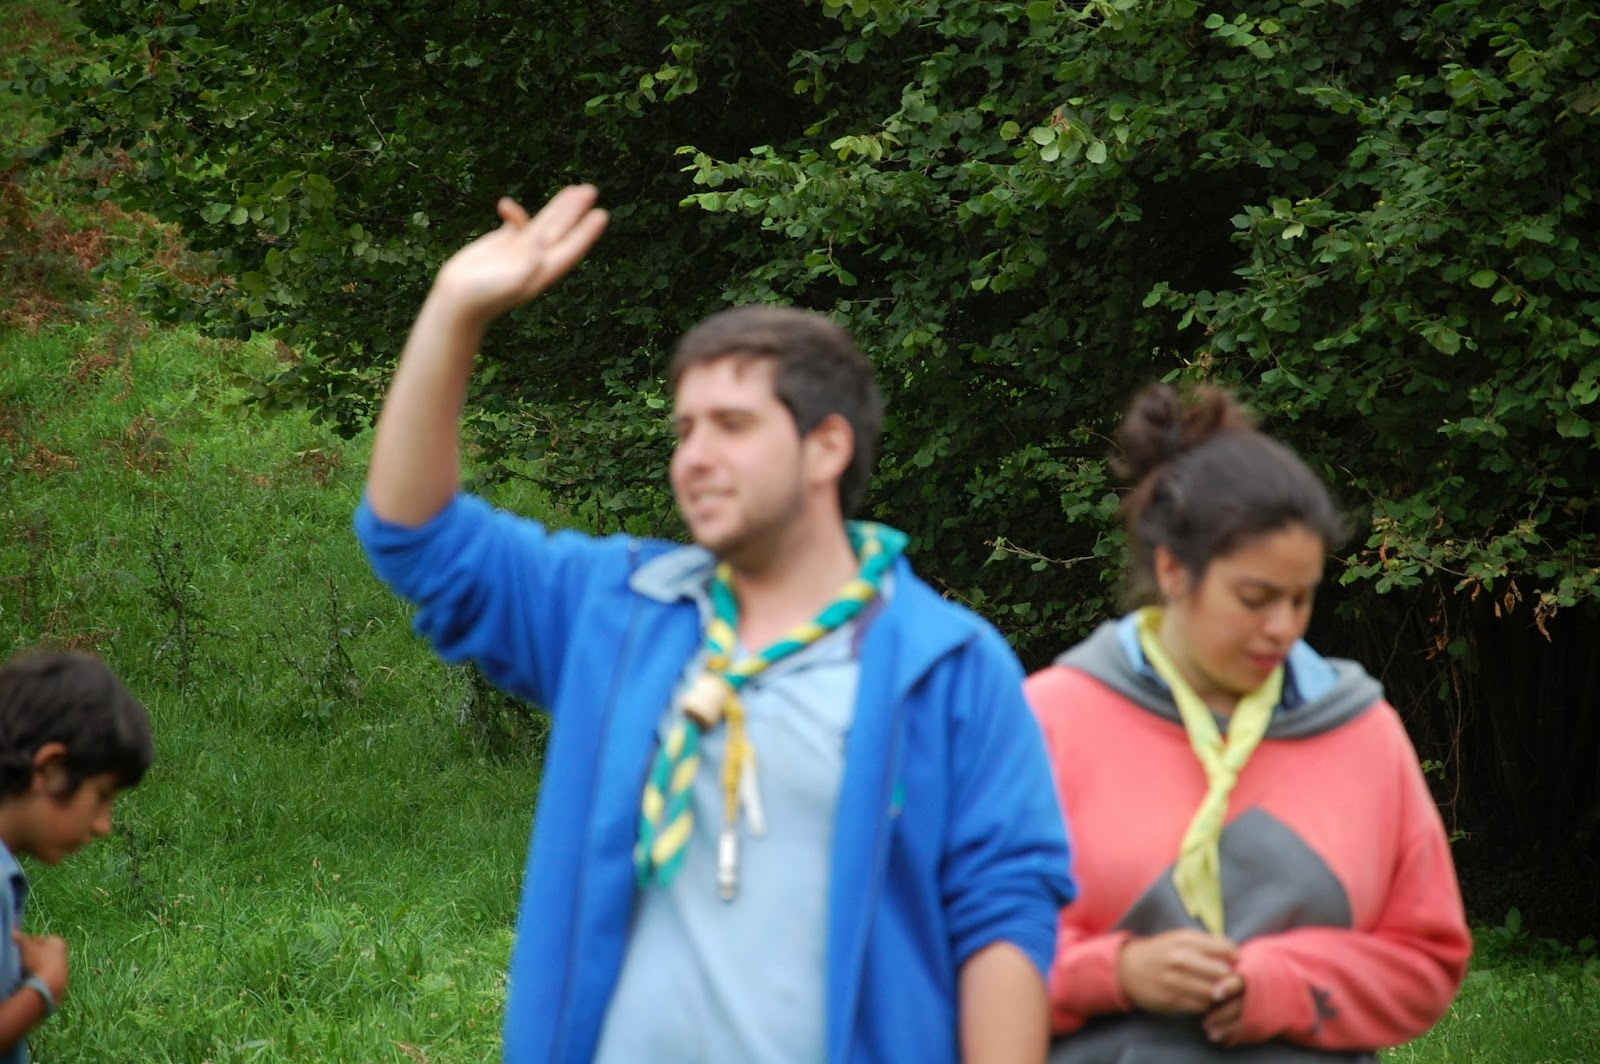 Campaments Estiu RolandKing 2011 - DSC_0299%2B2.JPG